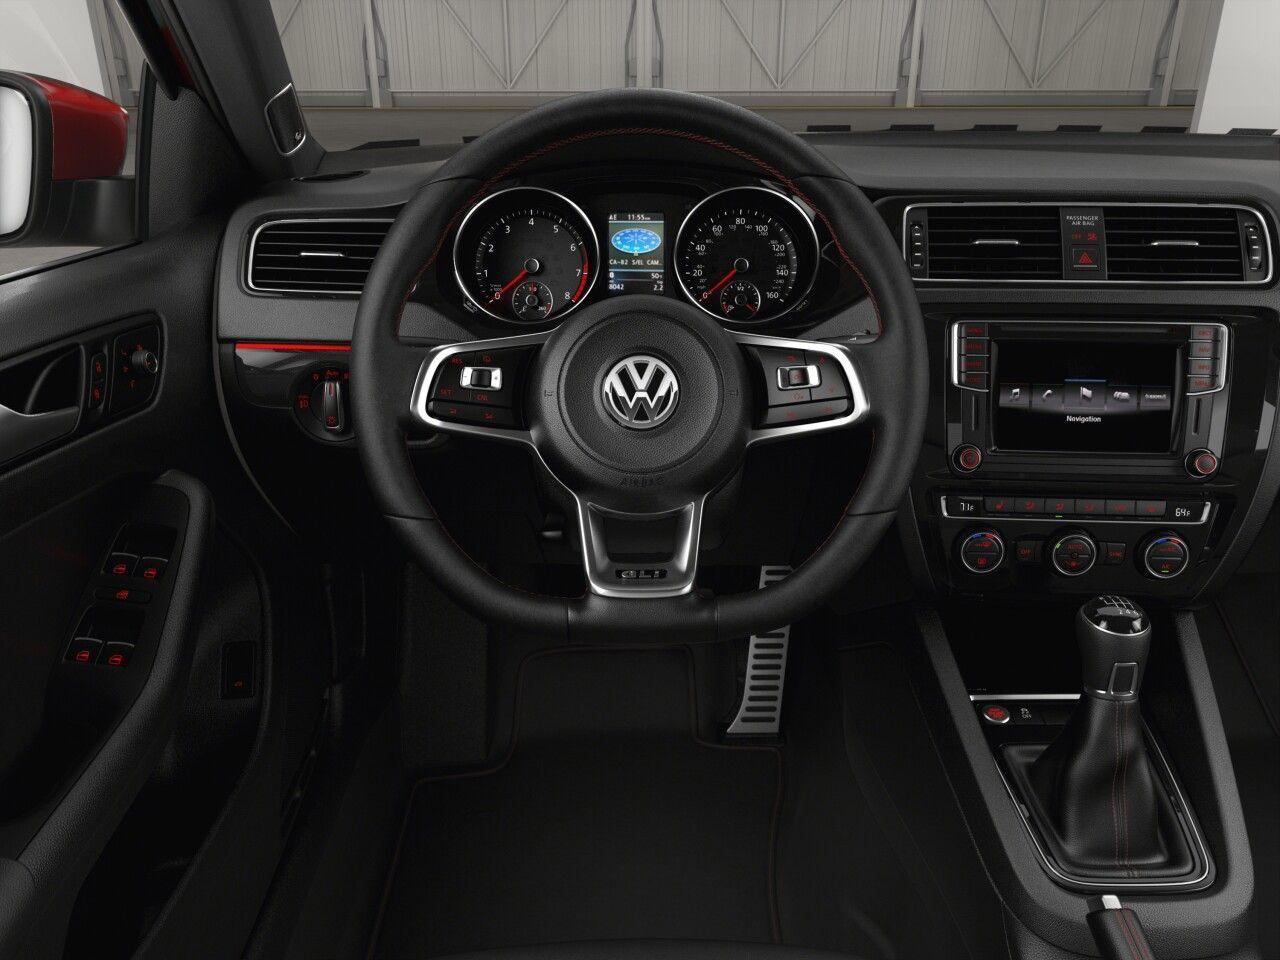 2016 Vw Jetta Gli Sel Trim Volkswagen Volkswagenjetta Volkswagen Jetta Jetta Gli Vw Jetta Tdi